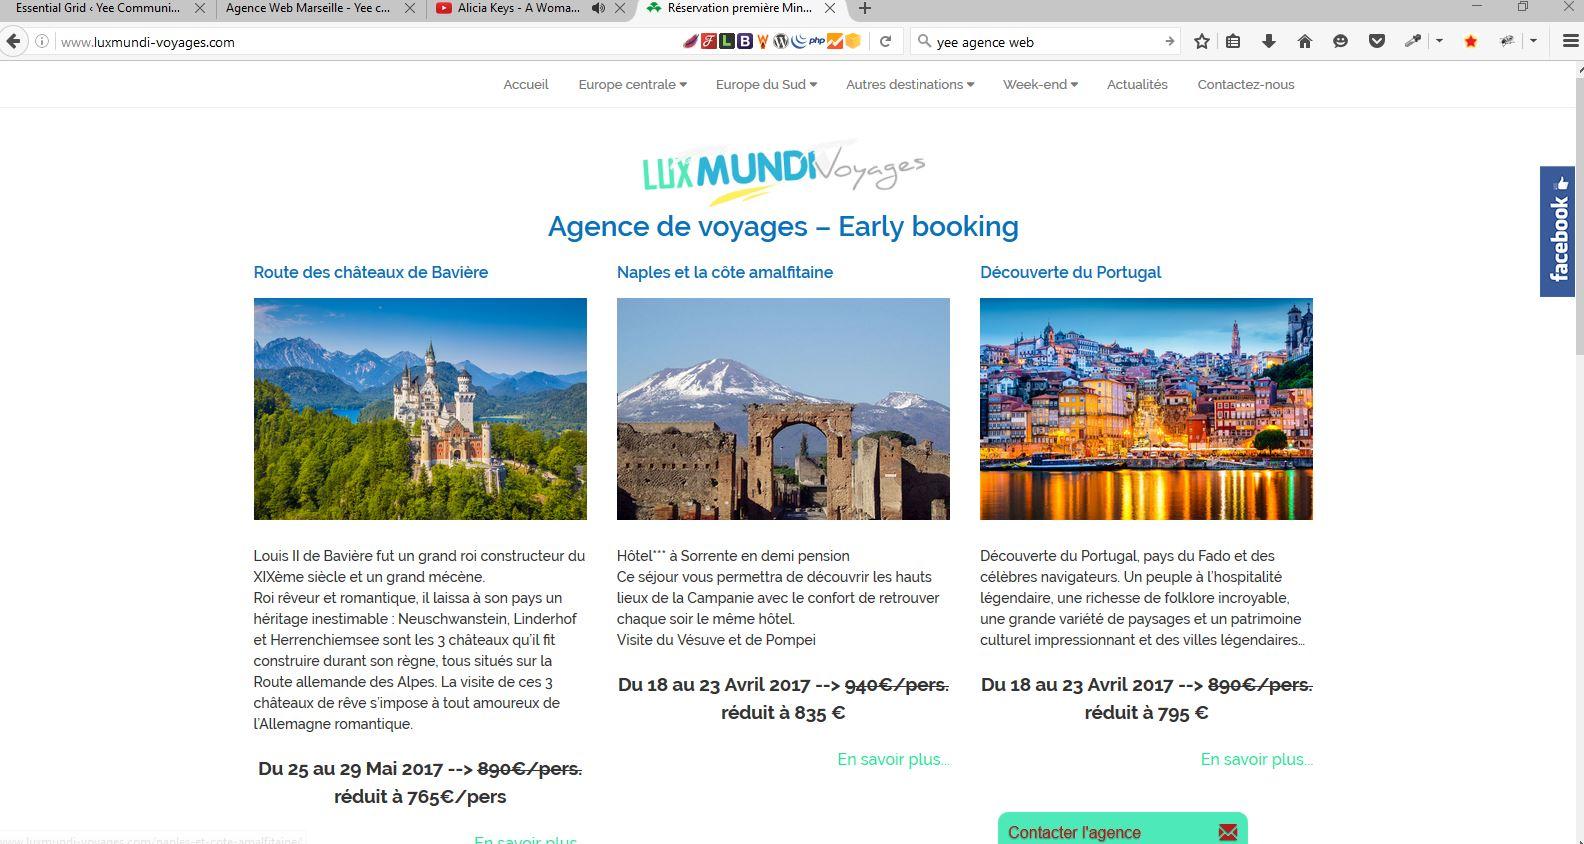 reference-luxmundi-voyages